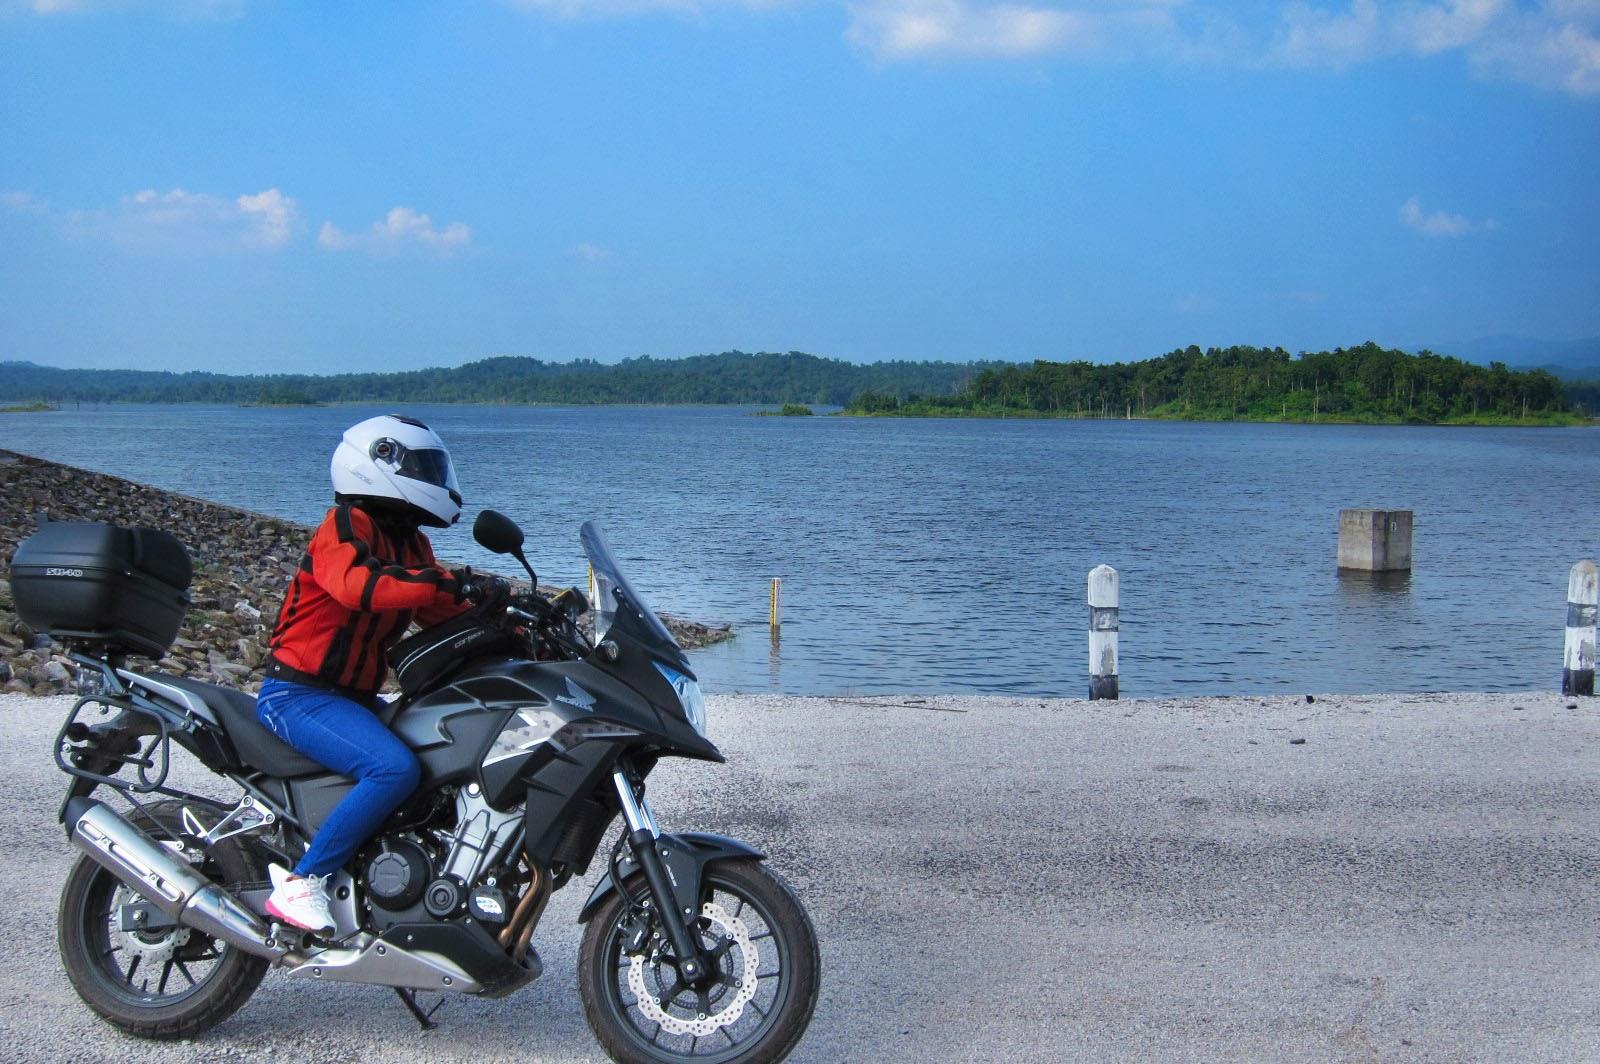 1998 Honda Accord Reviews >> Cb500x Accessories Thailand.html | Autos Post